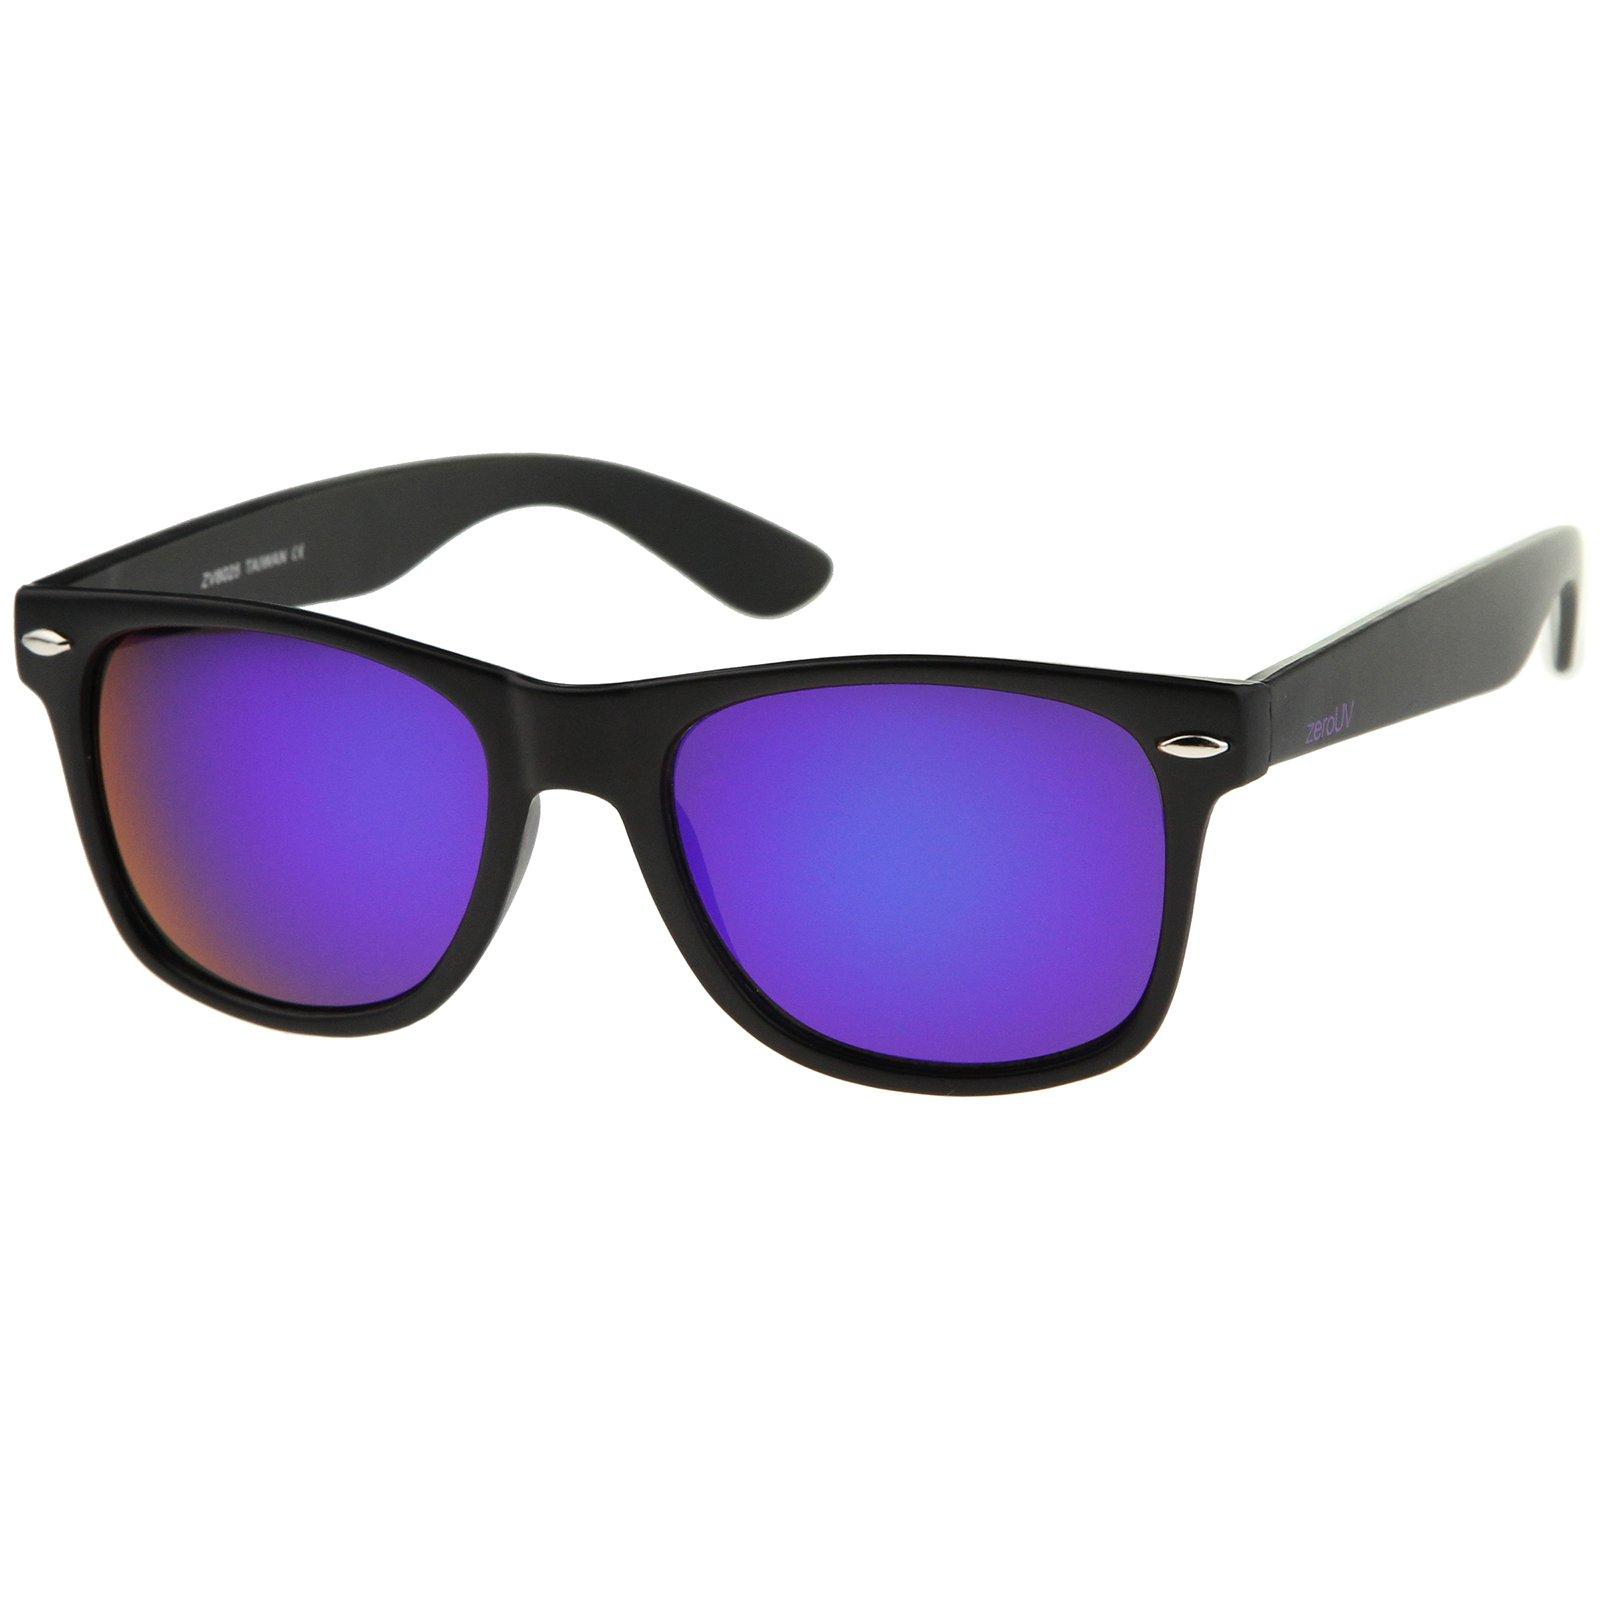 zeroUV - Retro 80's Classic Colored Mirror Lens Square Horn Rimmed Sunglasses for Men Women (Matte/Purple) by zeroUV